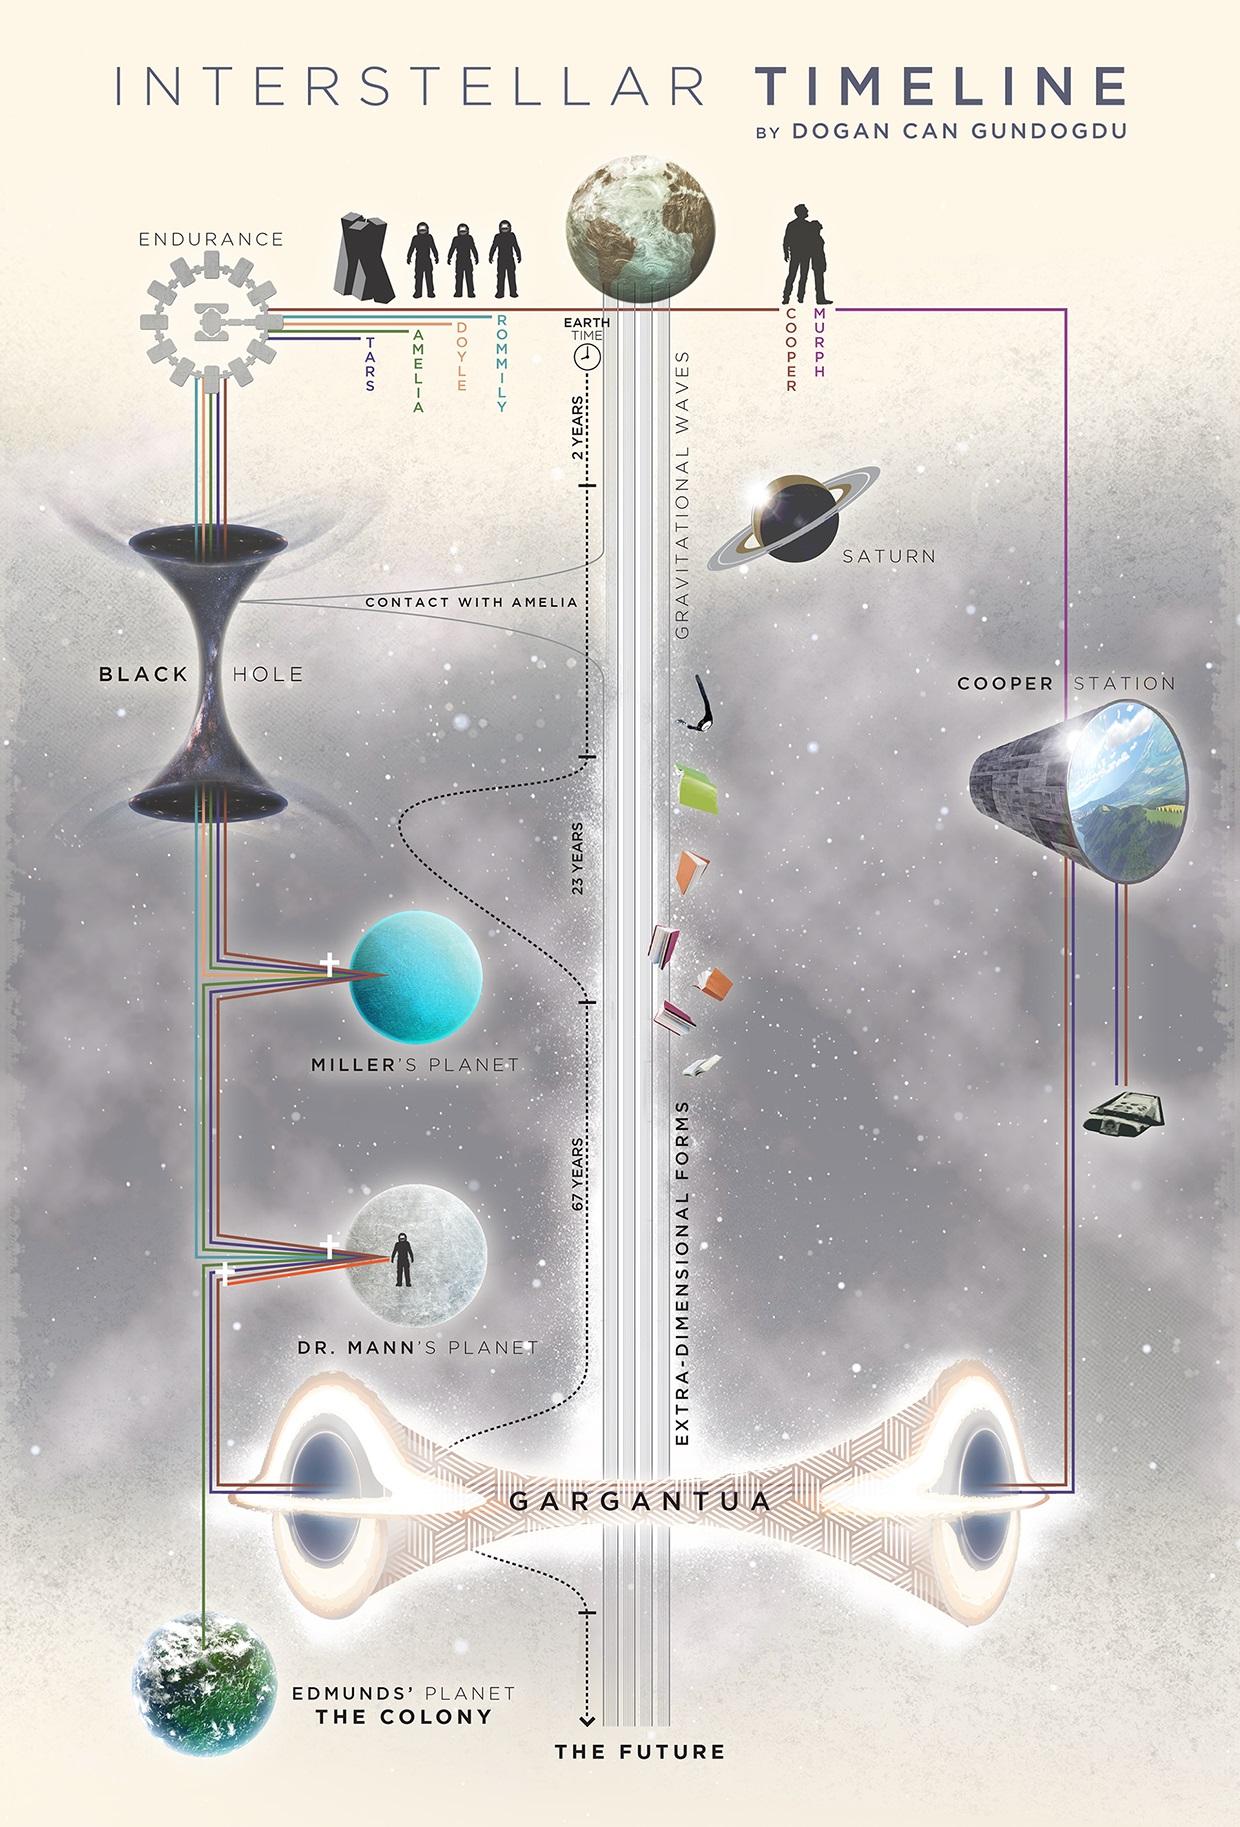 Interstellar Th 233 Ories Analyse Et Explication Sur L